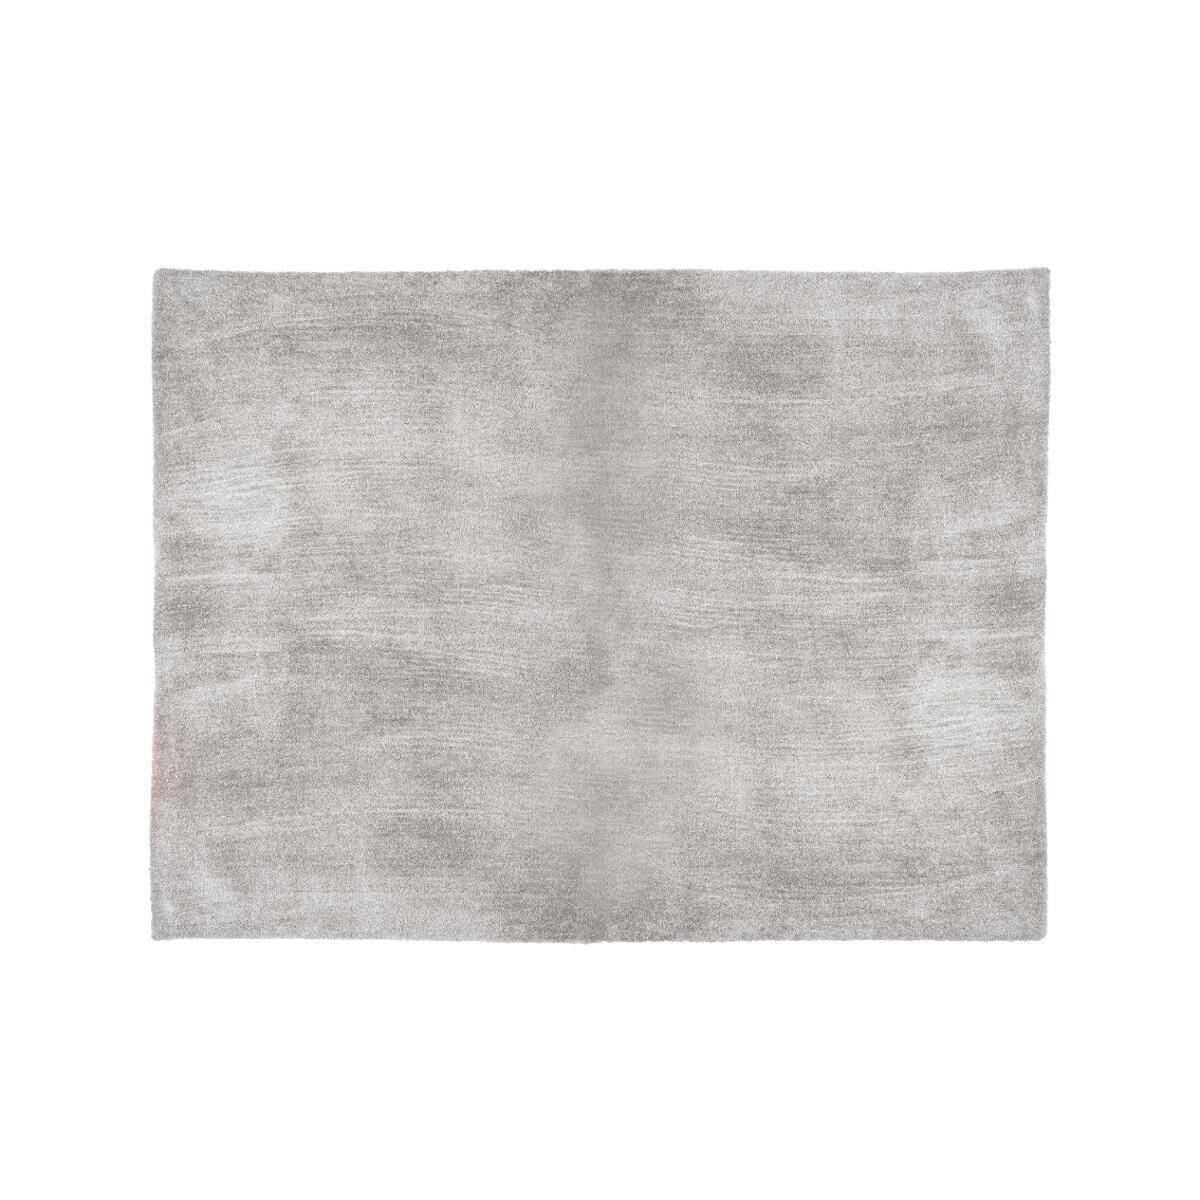 "Atmosphera Tapis ""Eddy"", gris souris 120x170 cm"